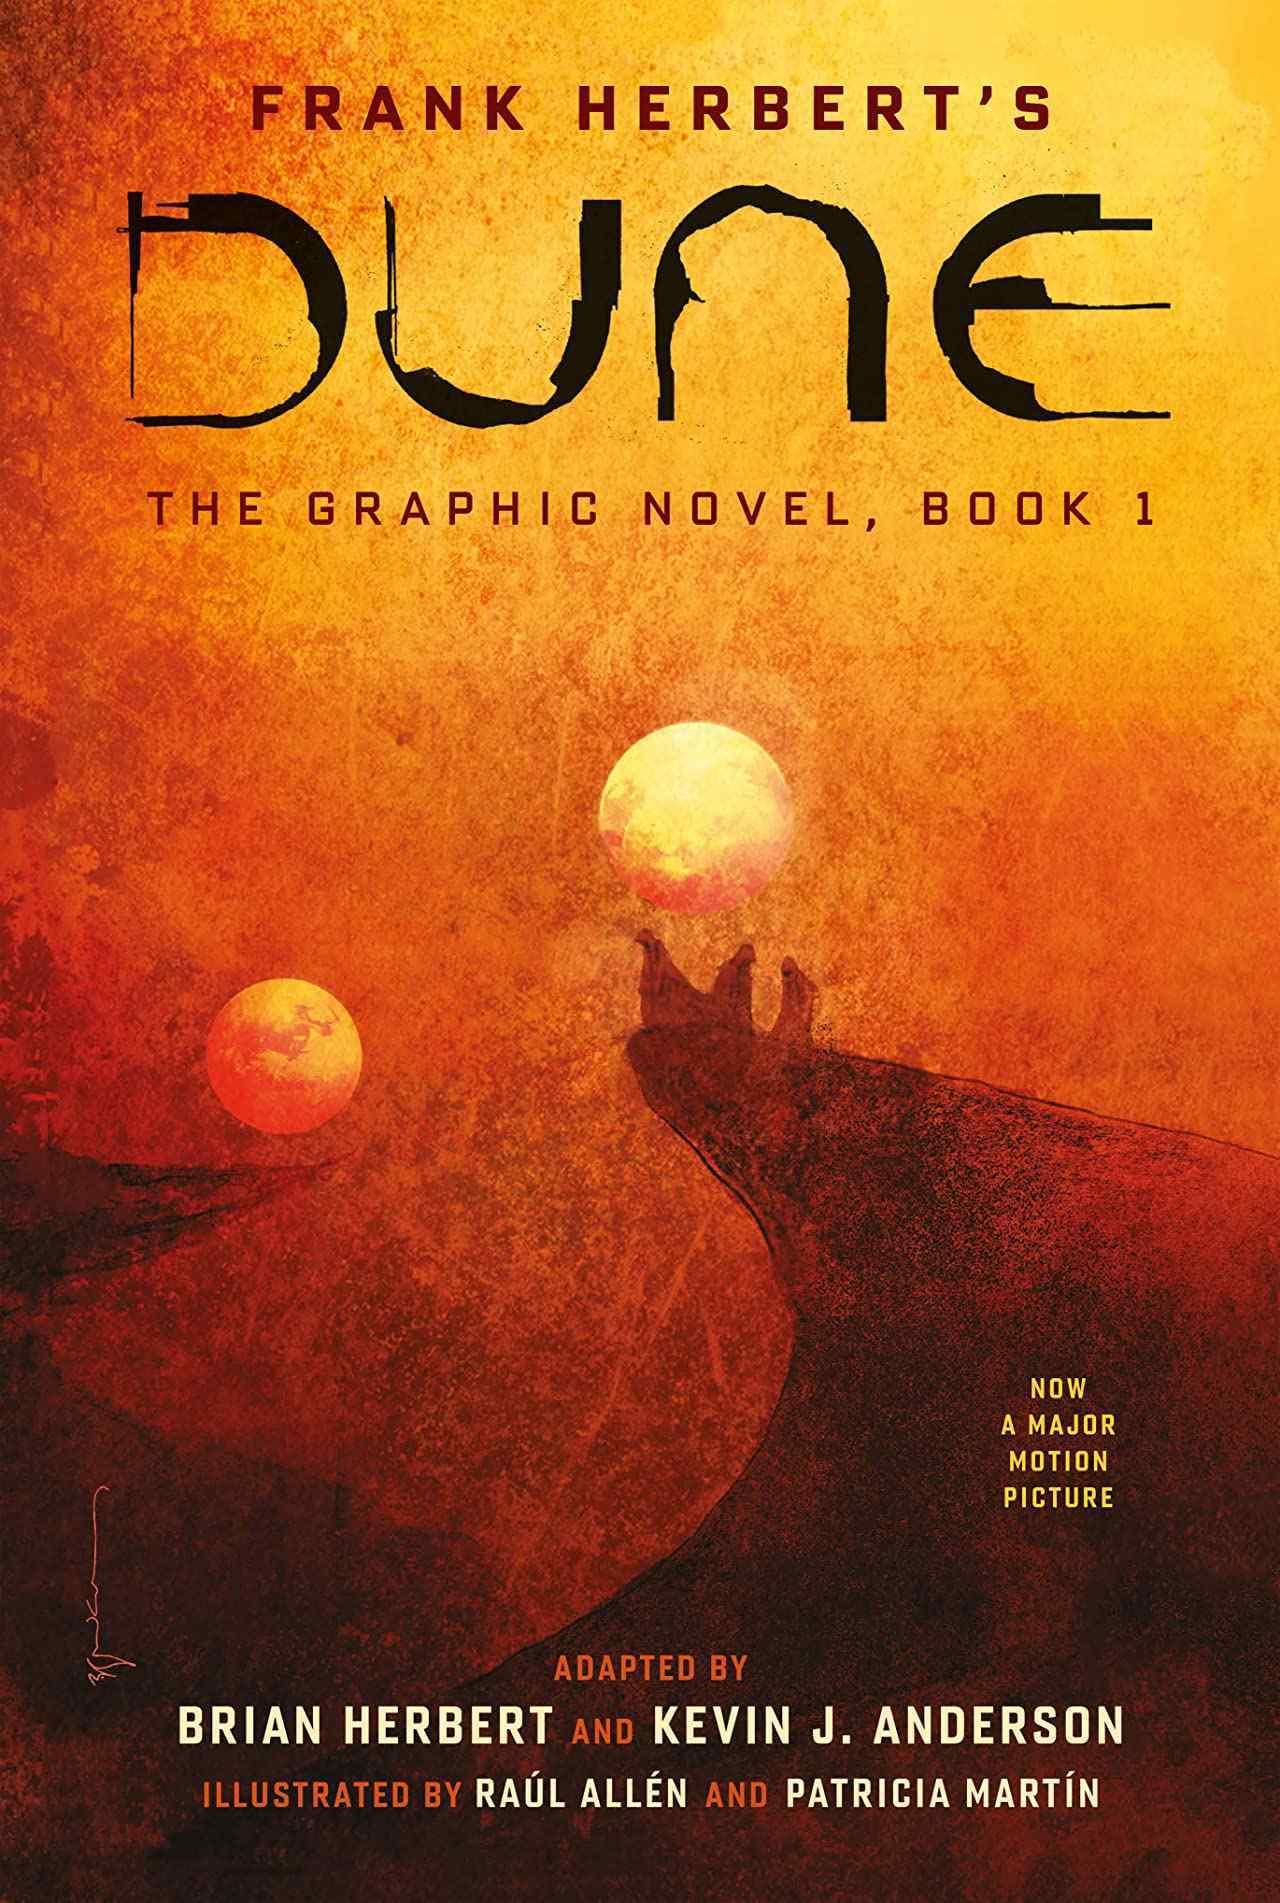 DUNE The Graphic Novel